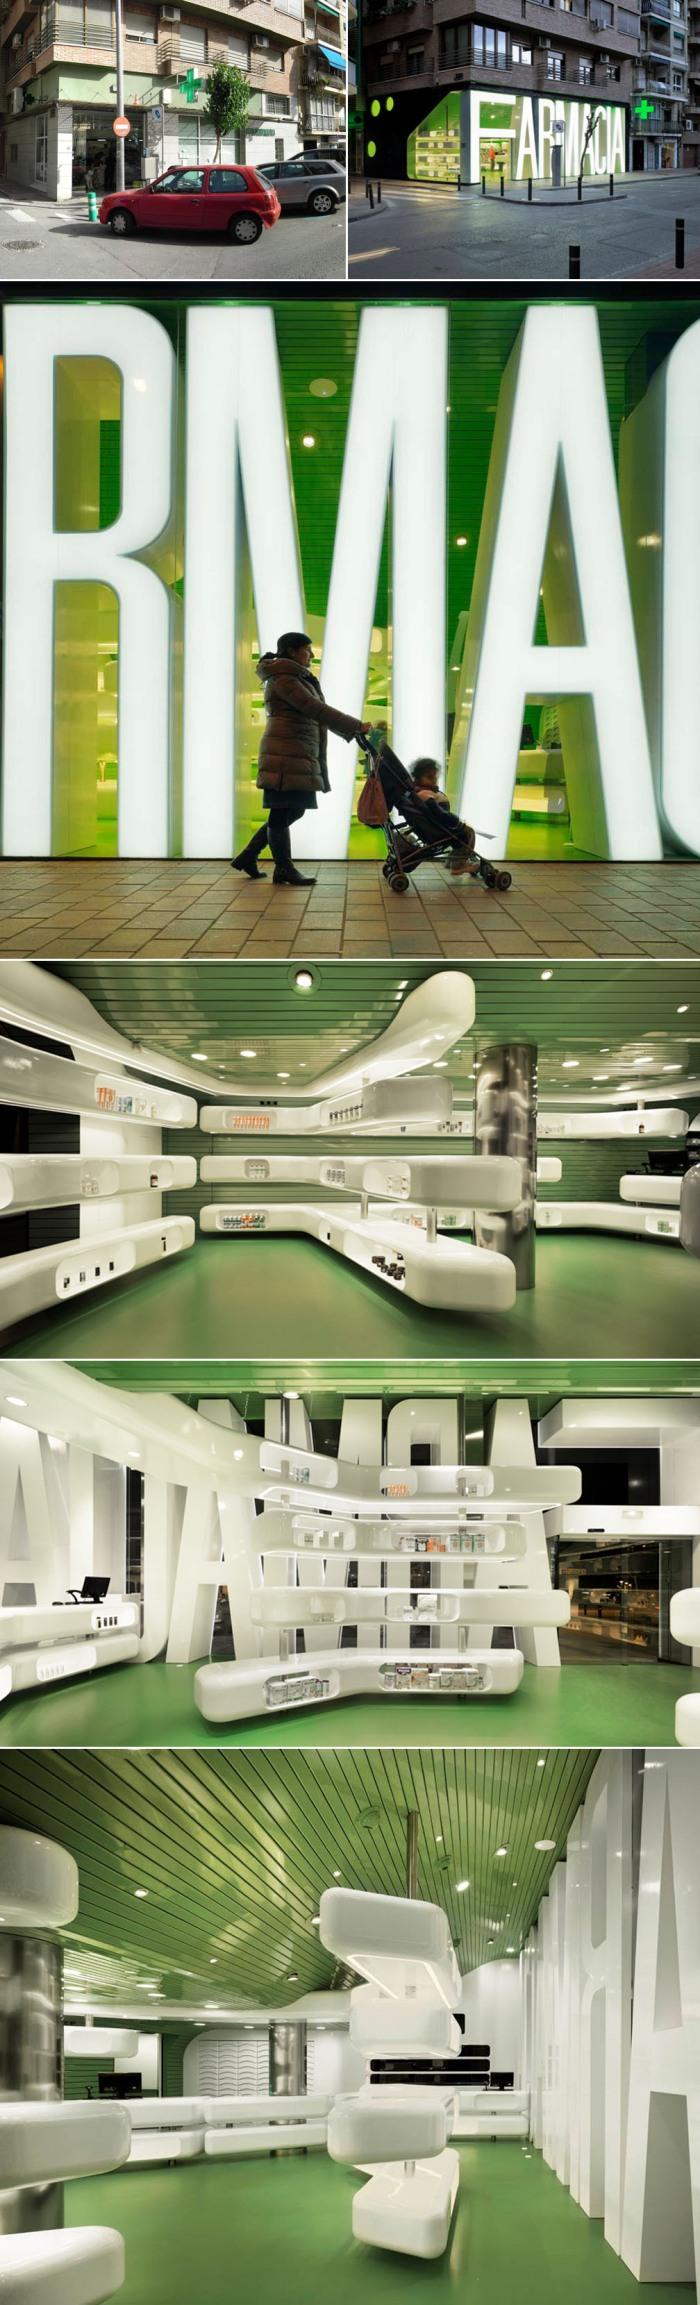 Renovation, Pharmacy, Murcia, Spain, Type, Architecture, Store design